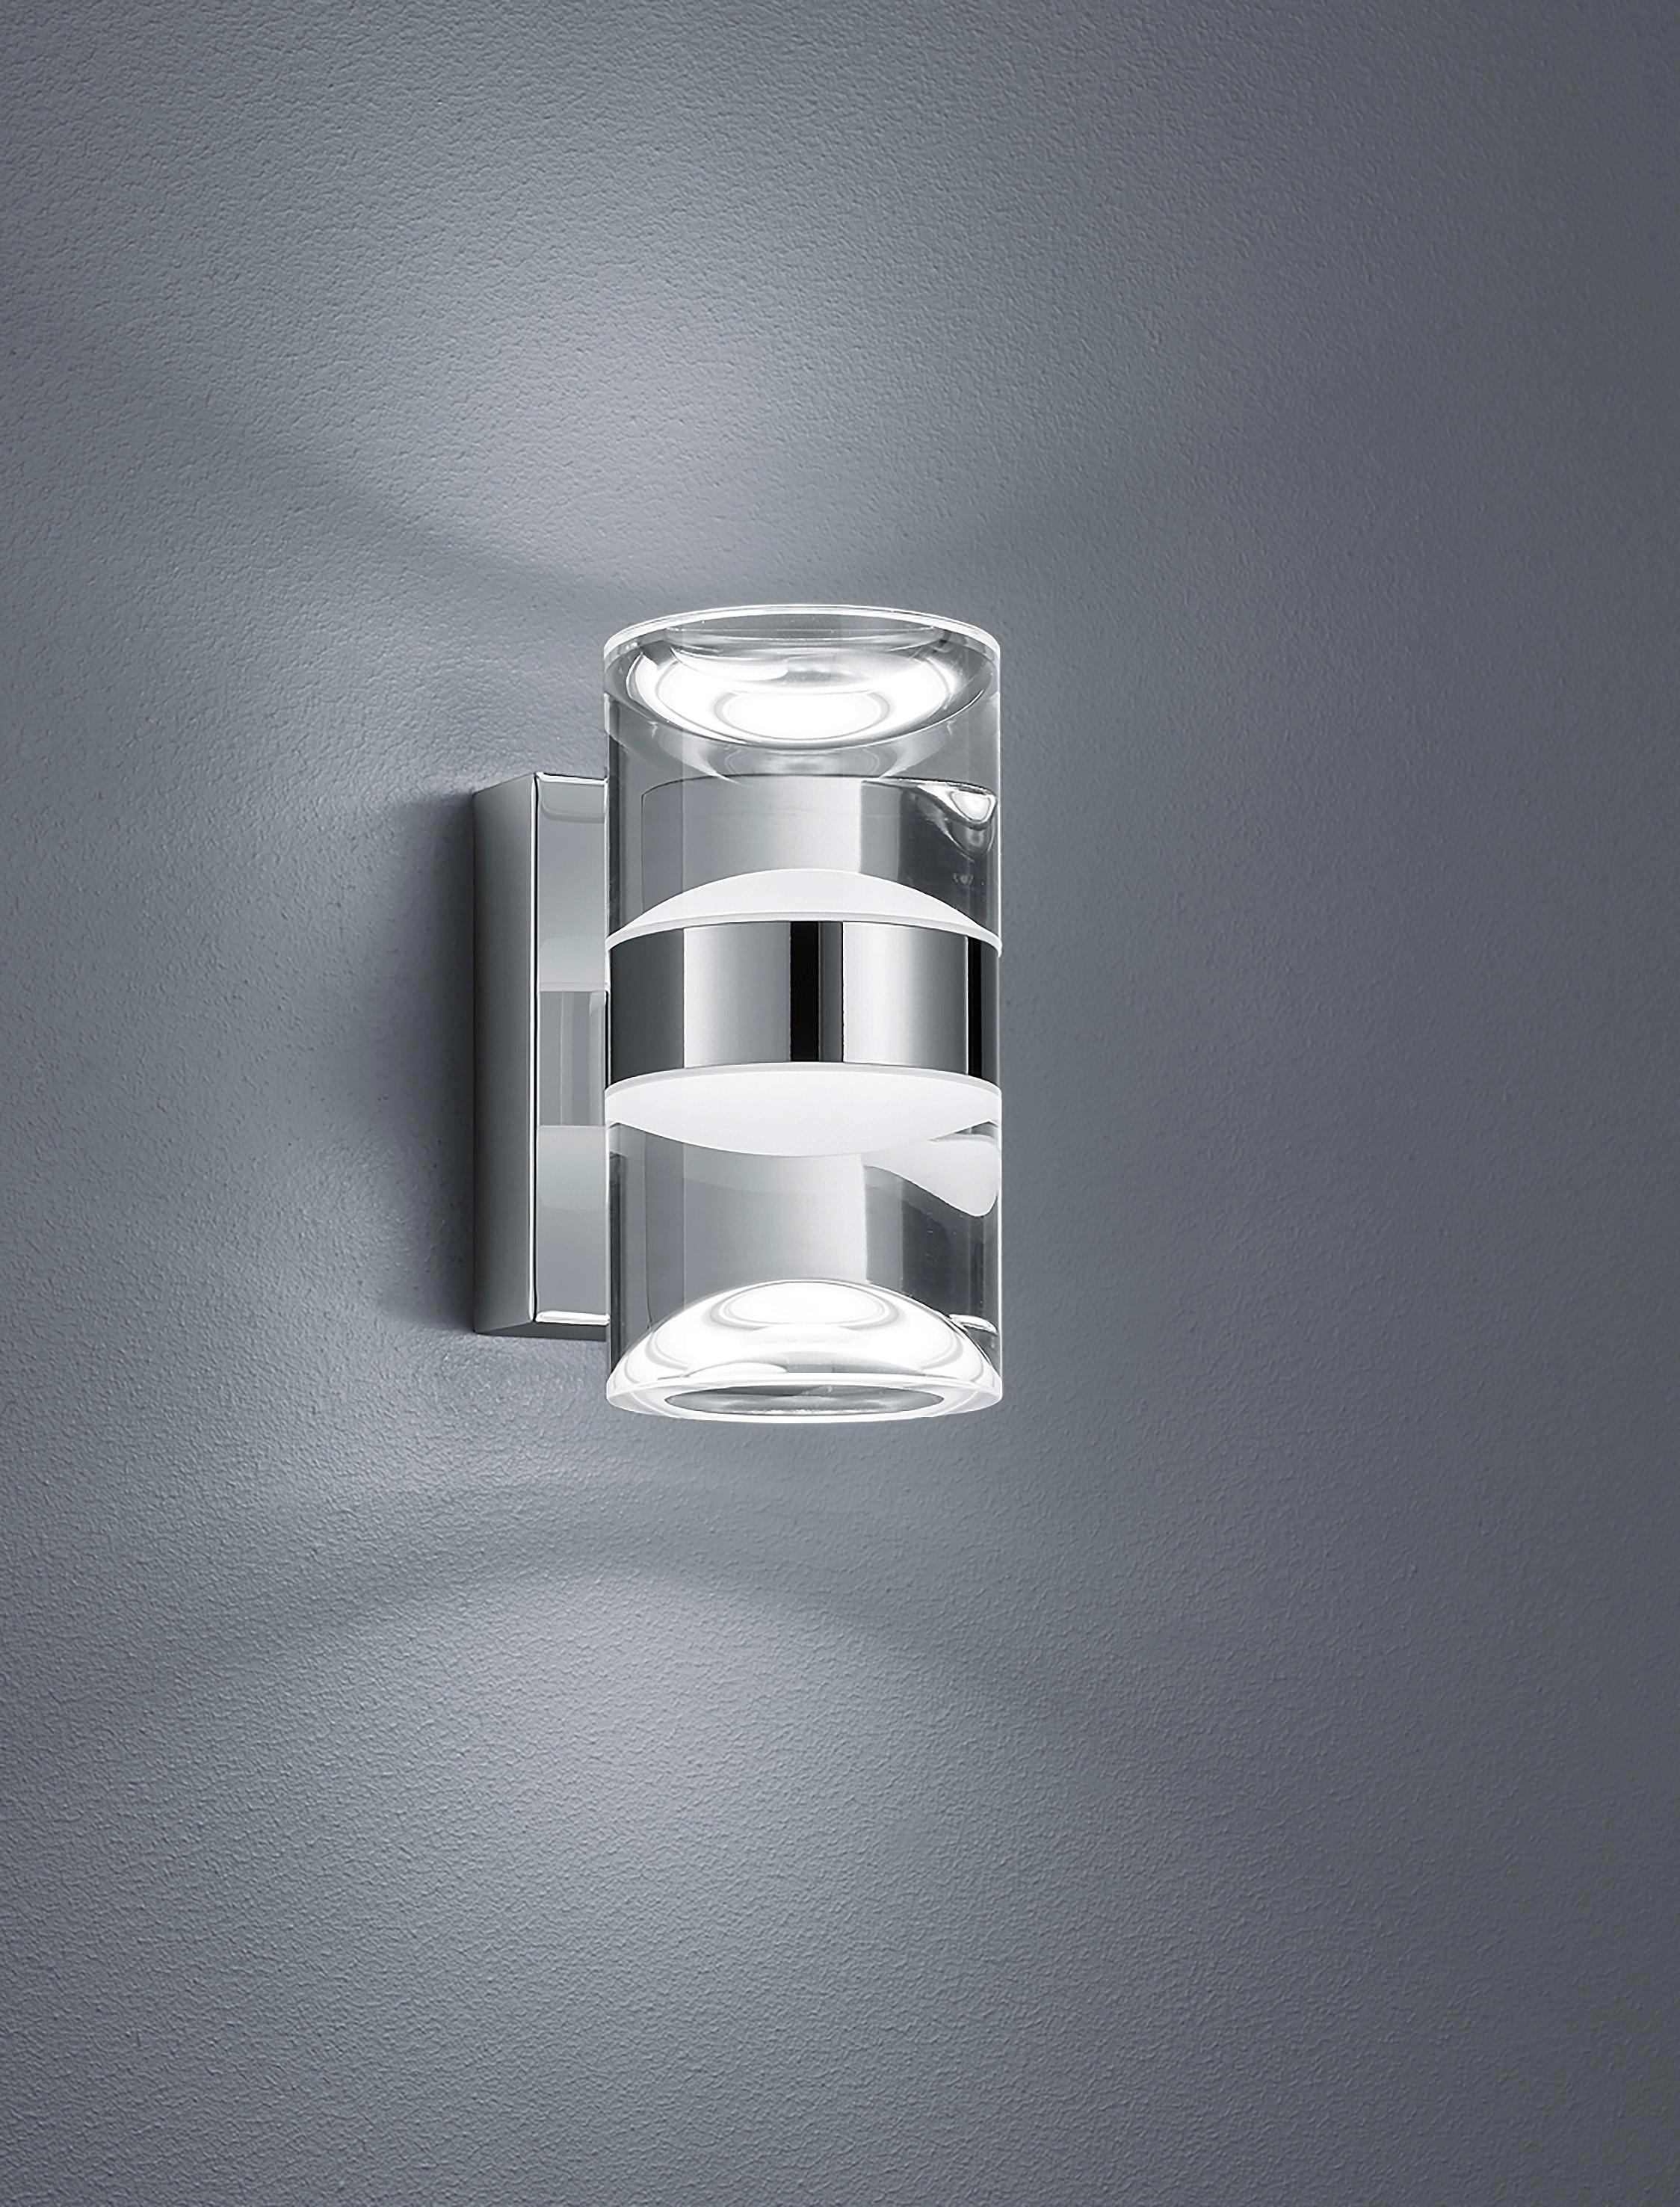 BADEZIMMER-WANDLEUCHTE - Chromfarben/Klar, Design, Kunststoff/Metall (16,0/8,5/12,5cm)